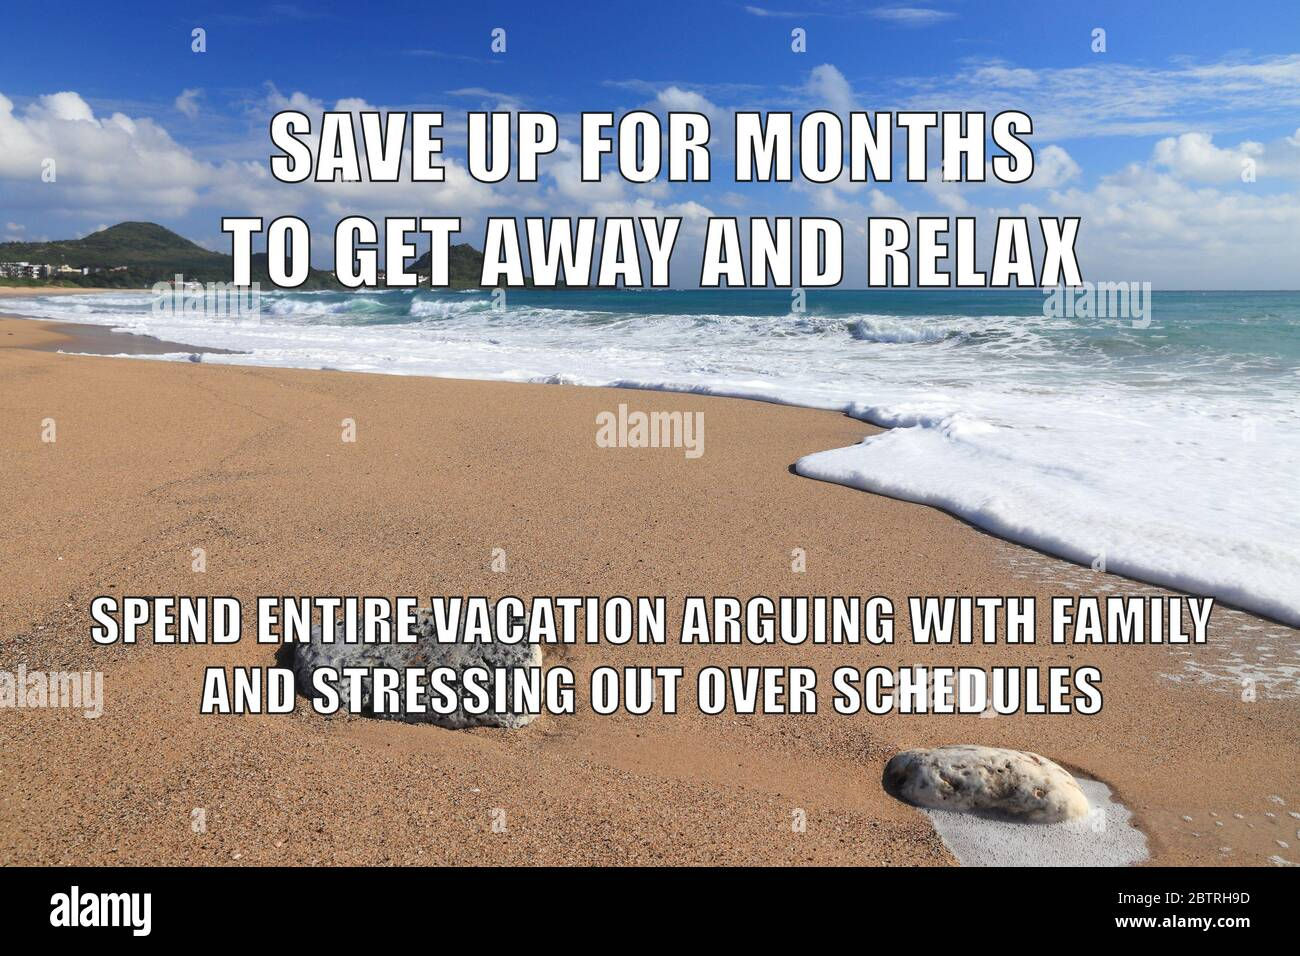 Vacation Stress Funny Meme For Social Media Sharing Beach Memes Stock Photo Alamy